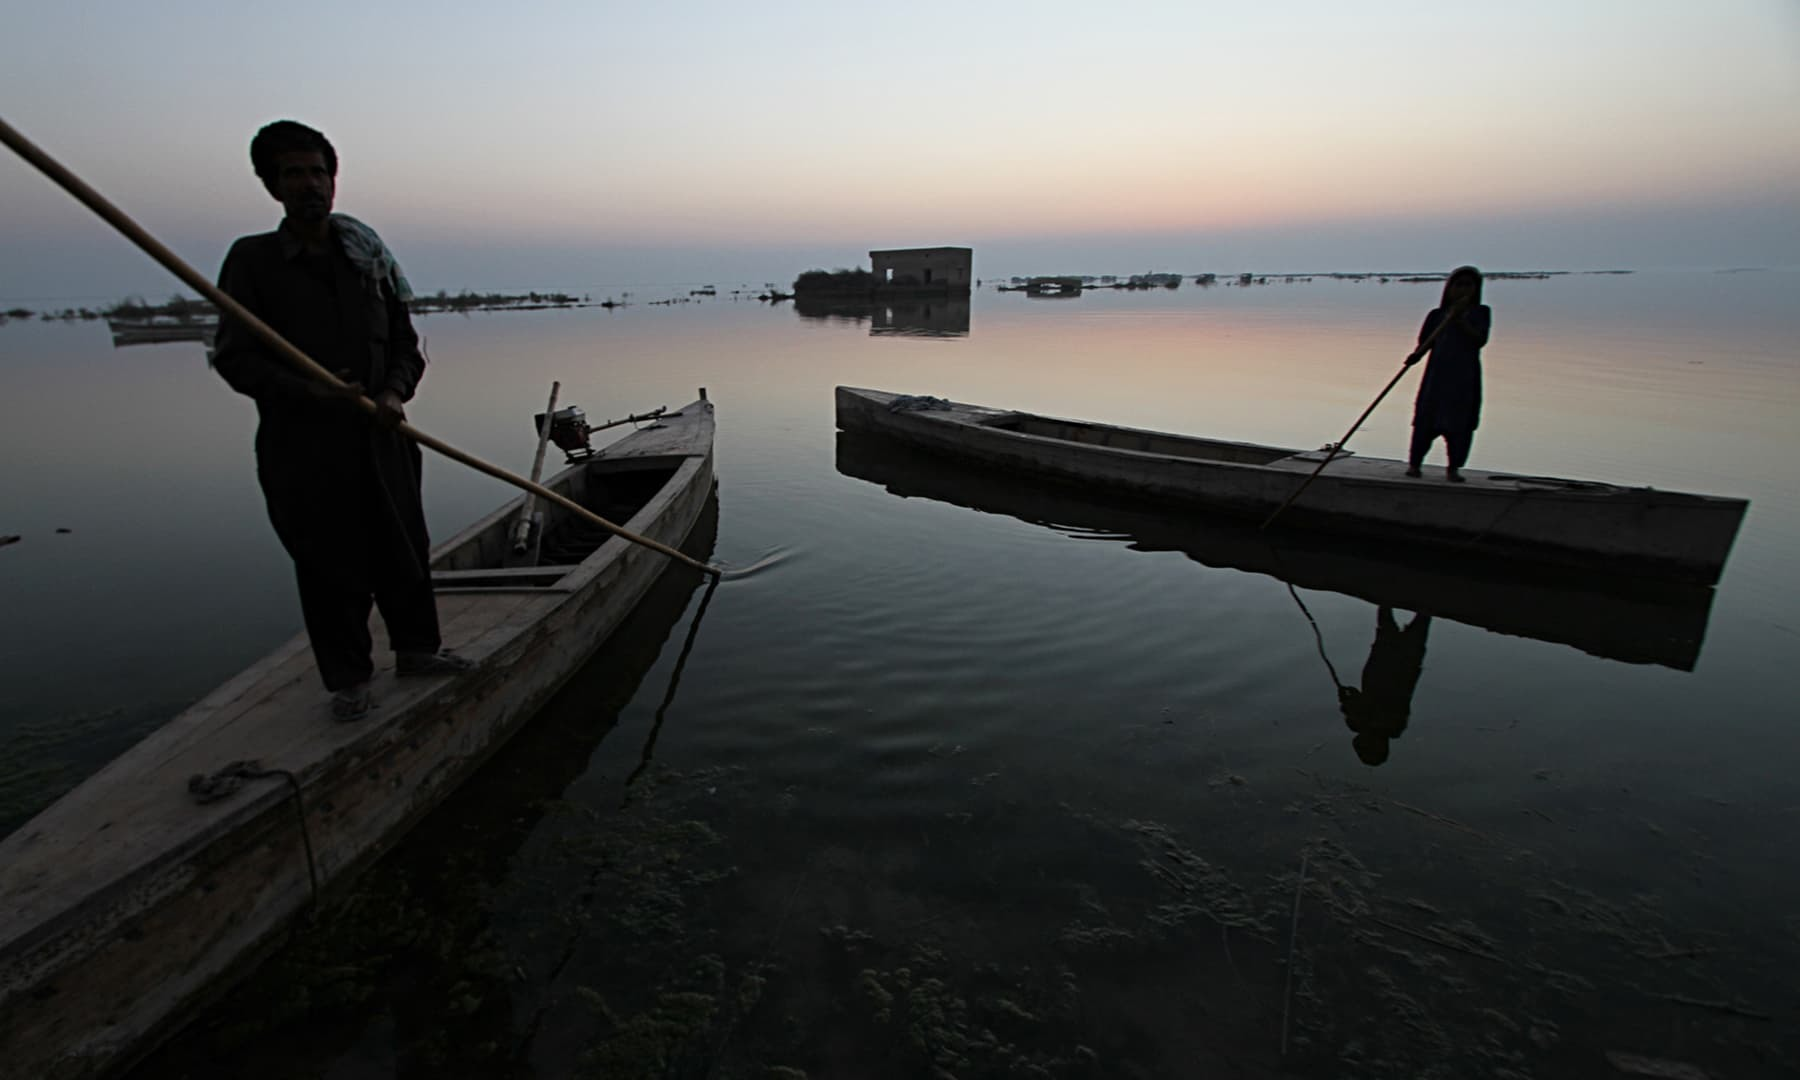 The travails of Gwadar's fishermen